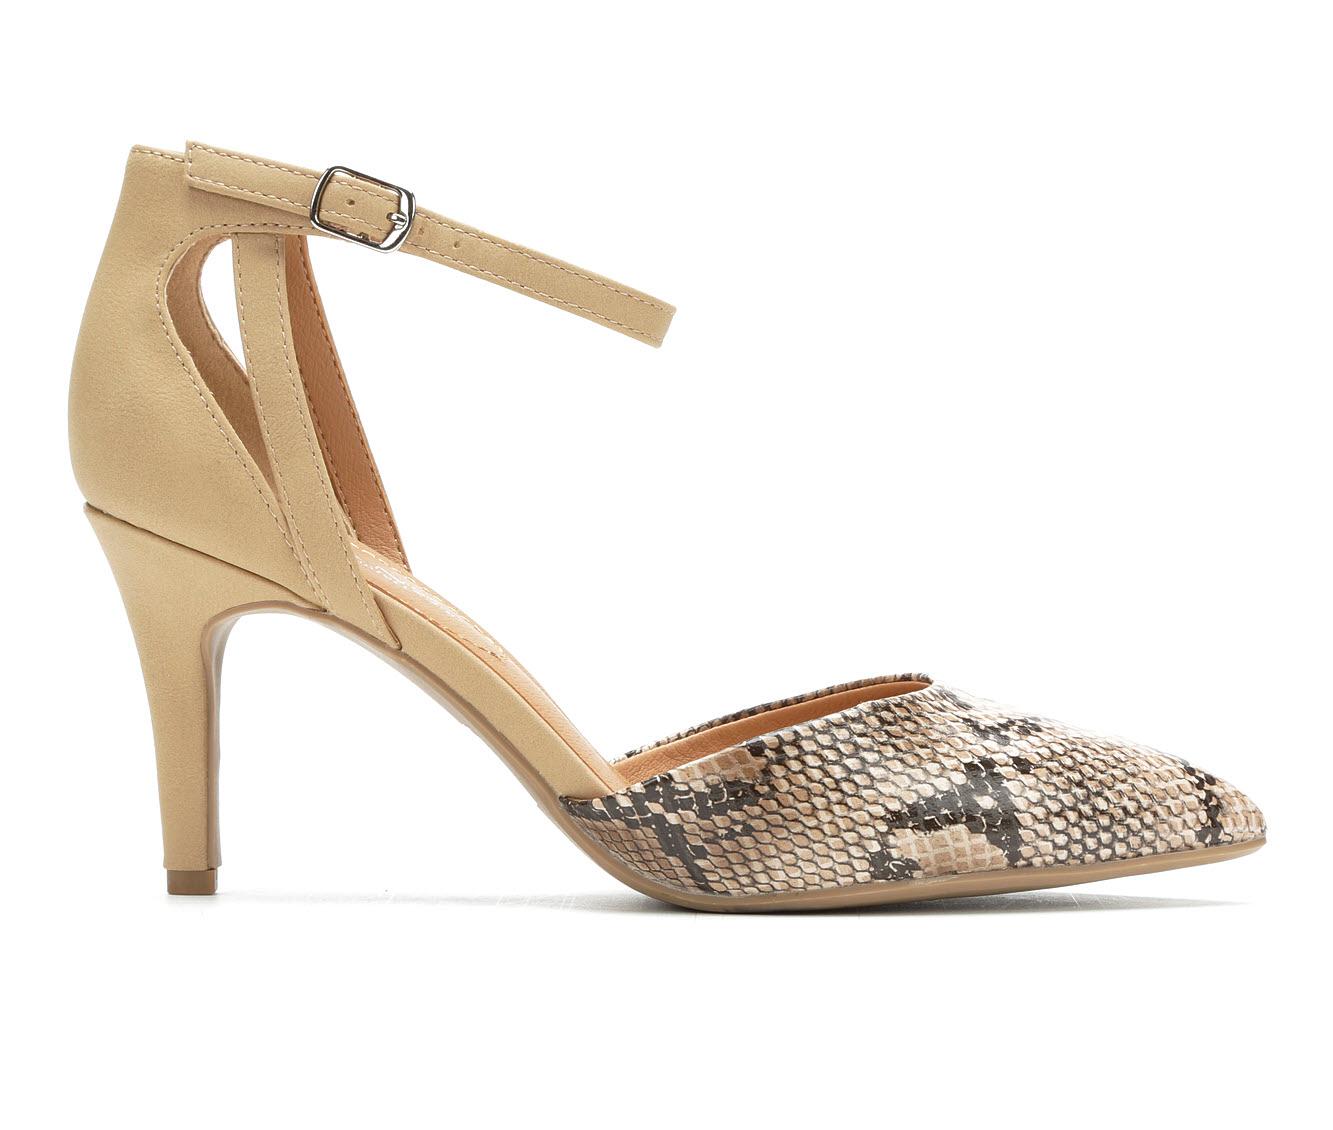 Solanz Alina Women's Dress Shoe (Beige Faux Leather)